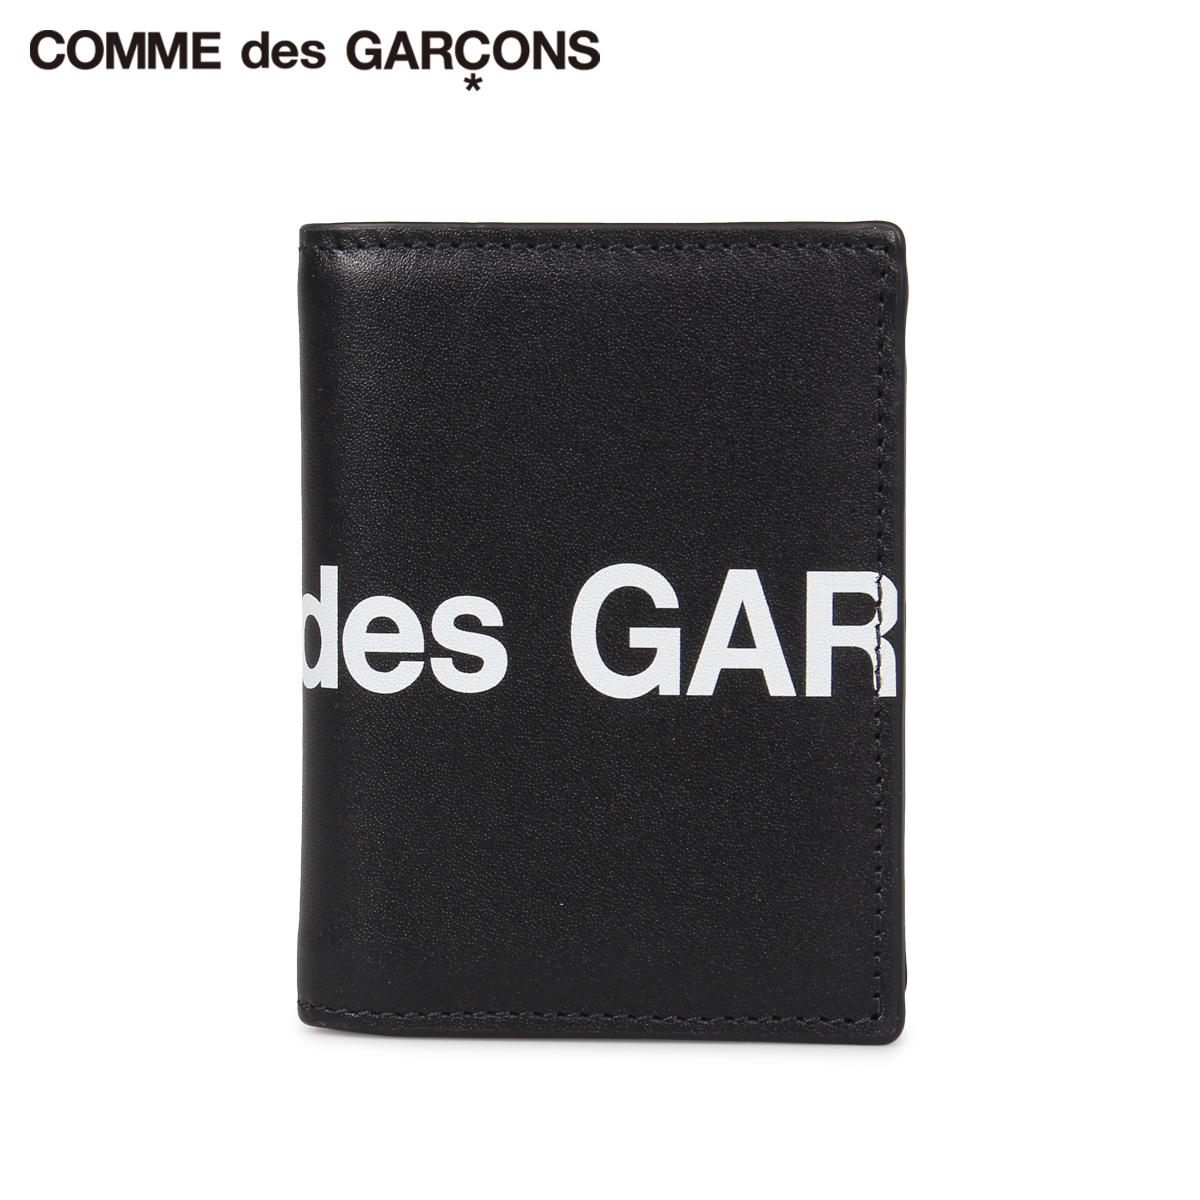 COMME des GARCONS HUGE LOGO WALLET コムデギャルソン 財布 二つ折り メンズ レディース 本革 ブラック 黒 SA0641HL